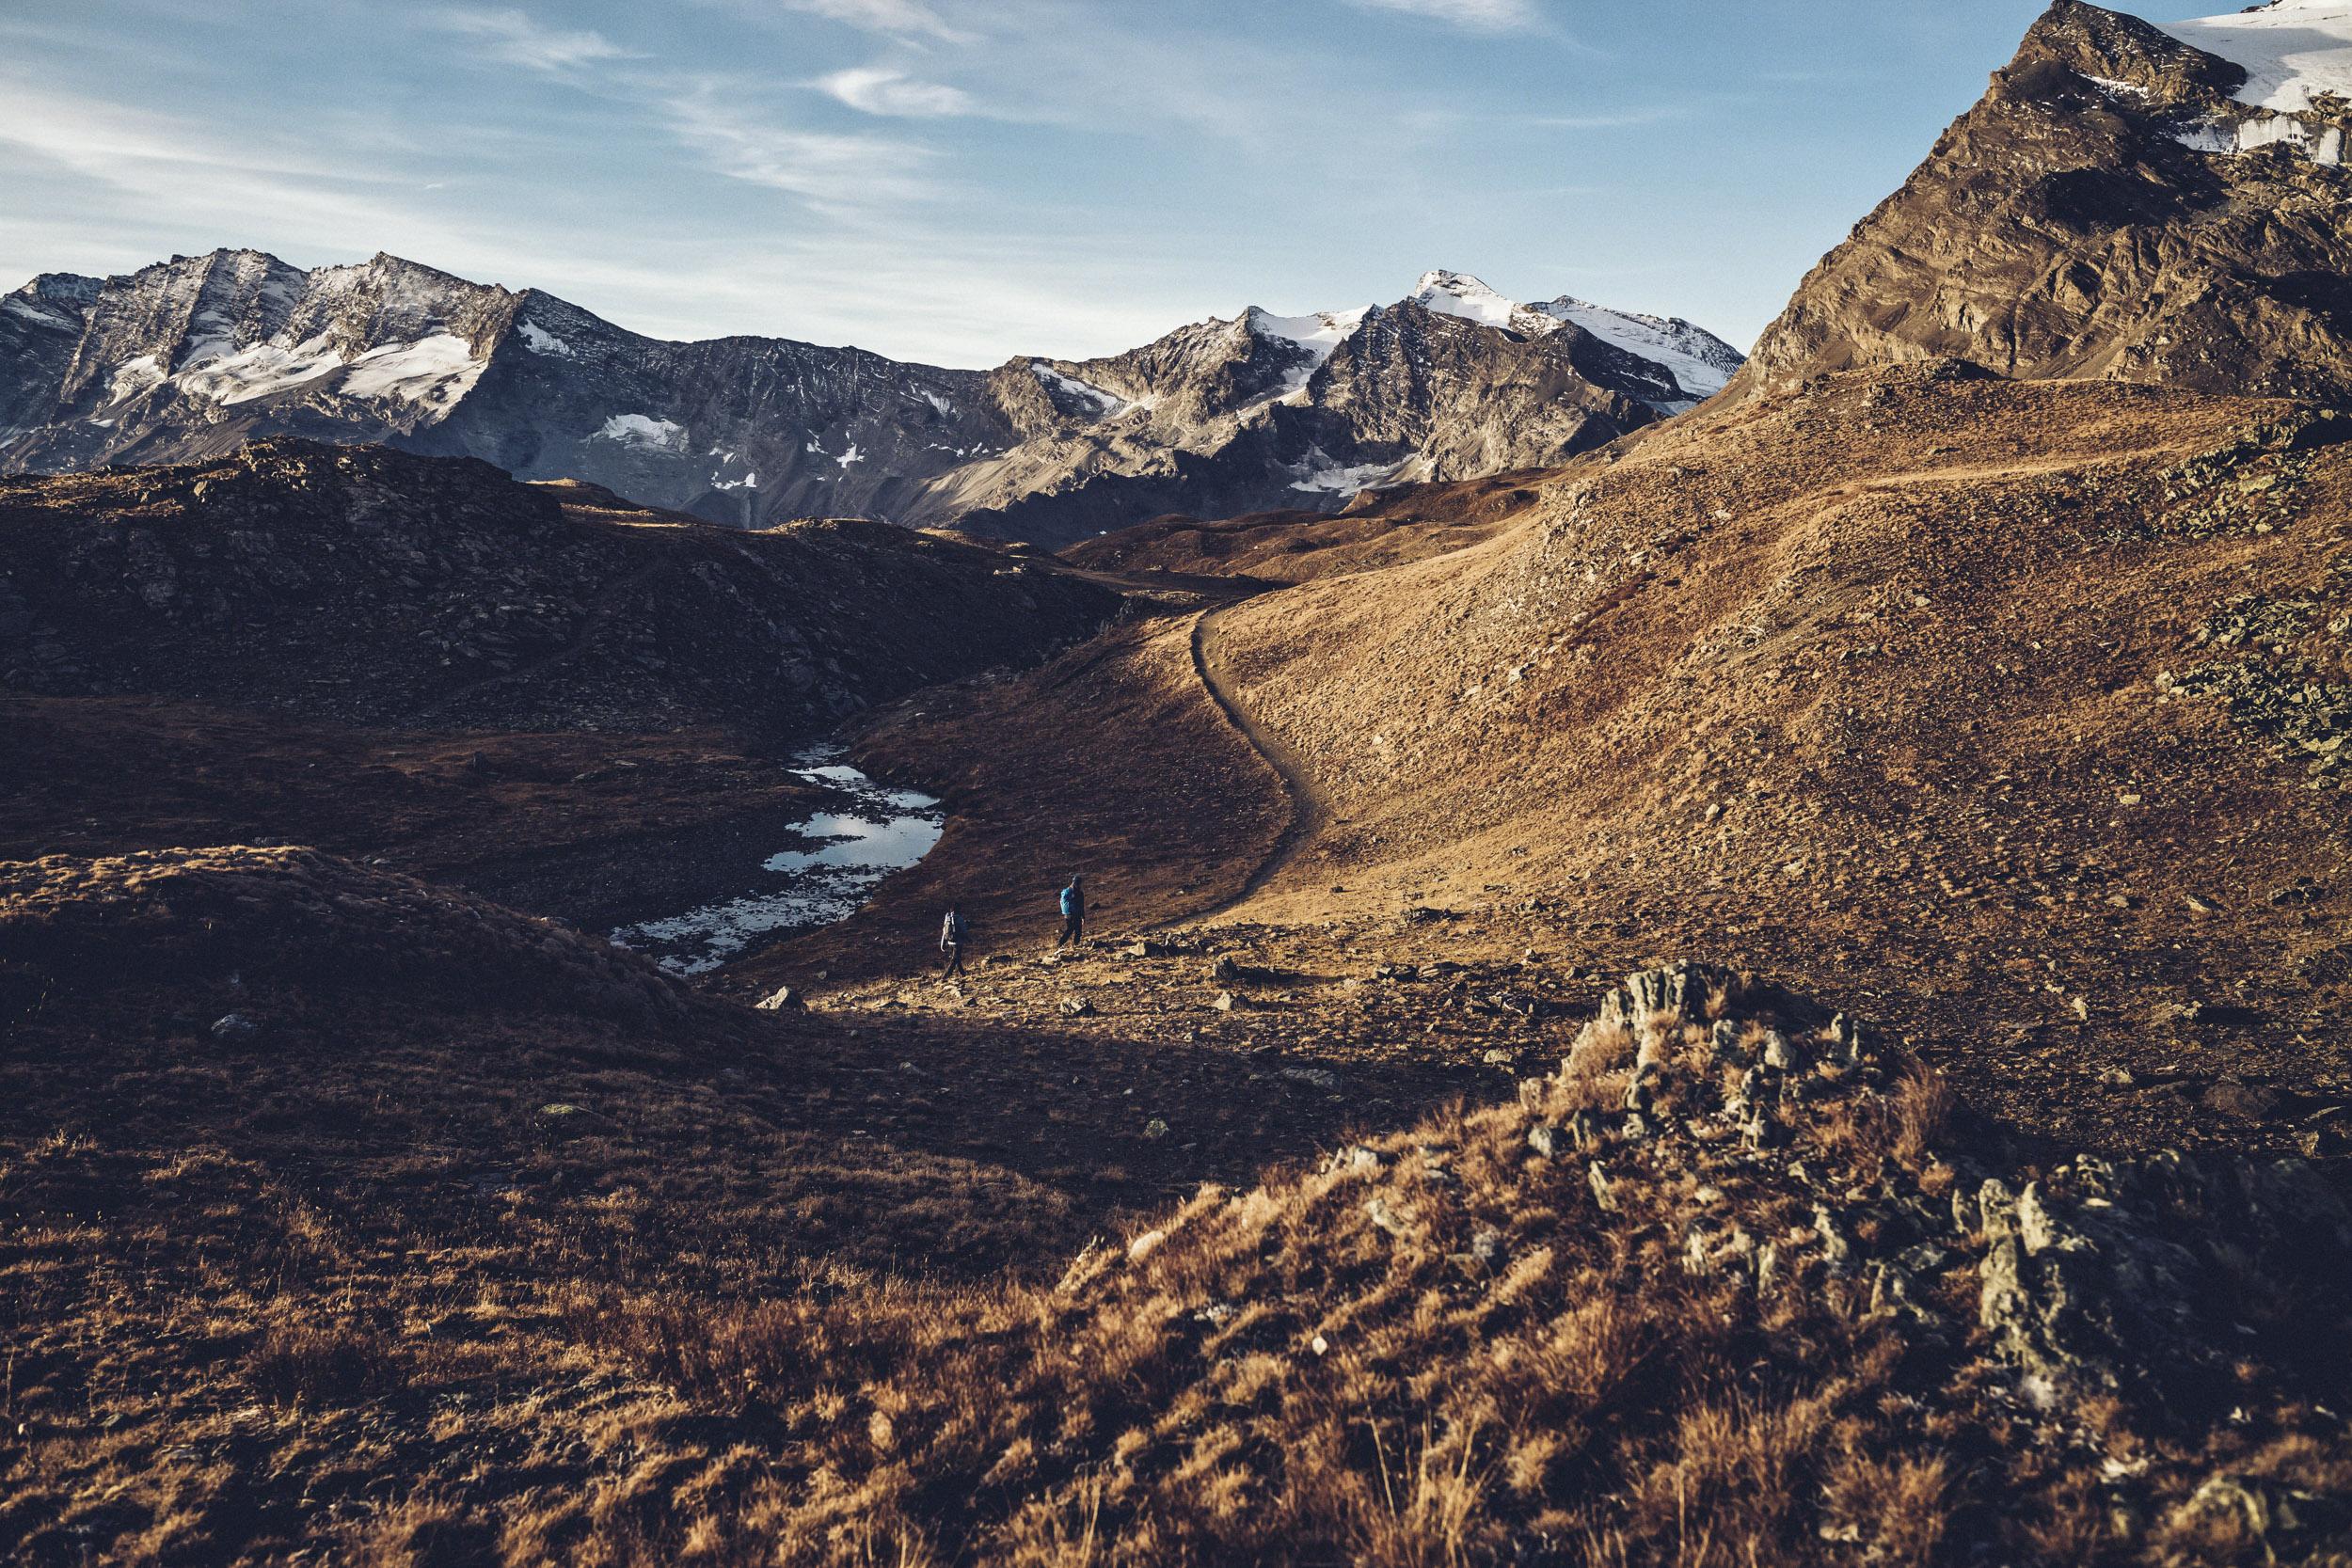 2019-SeifertUebler-luqel-outdoor-mountain-lifestyle003.jpg